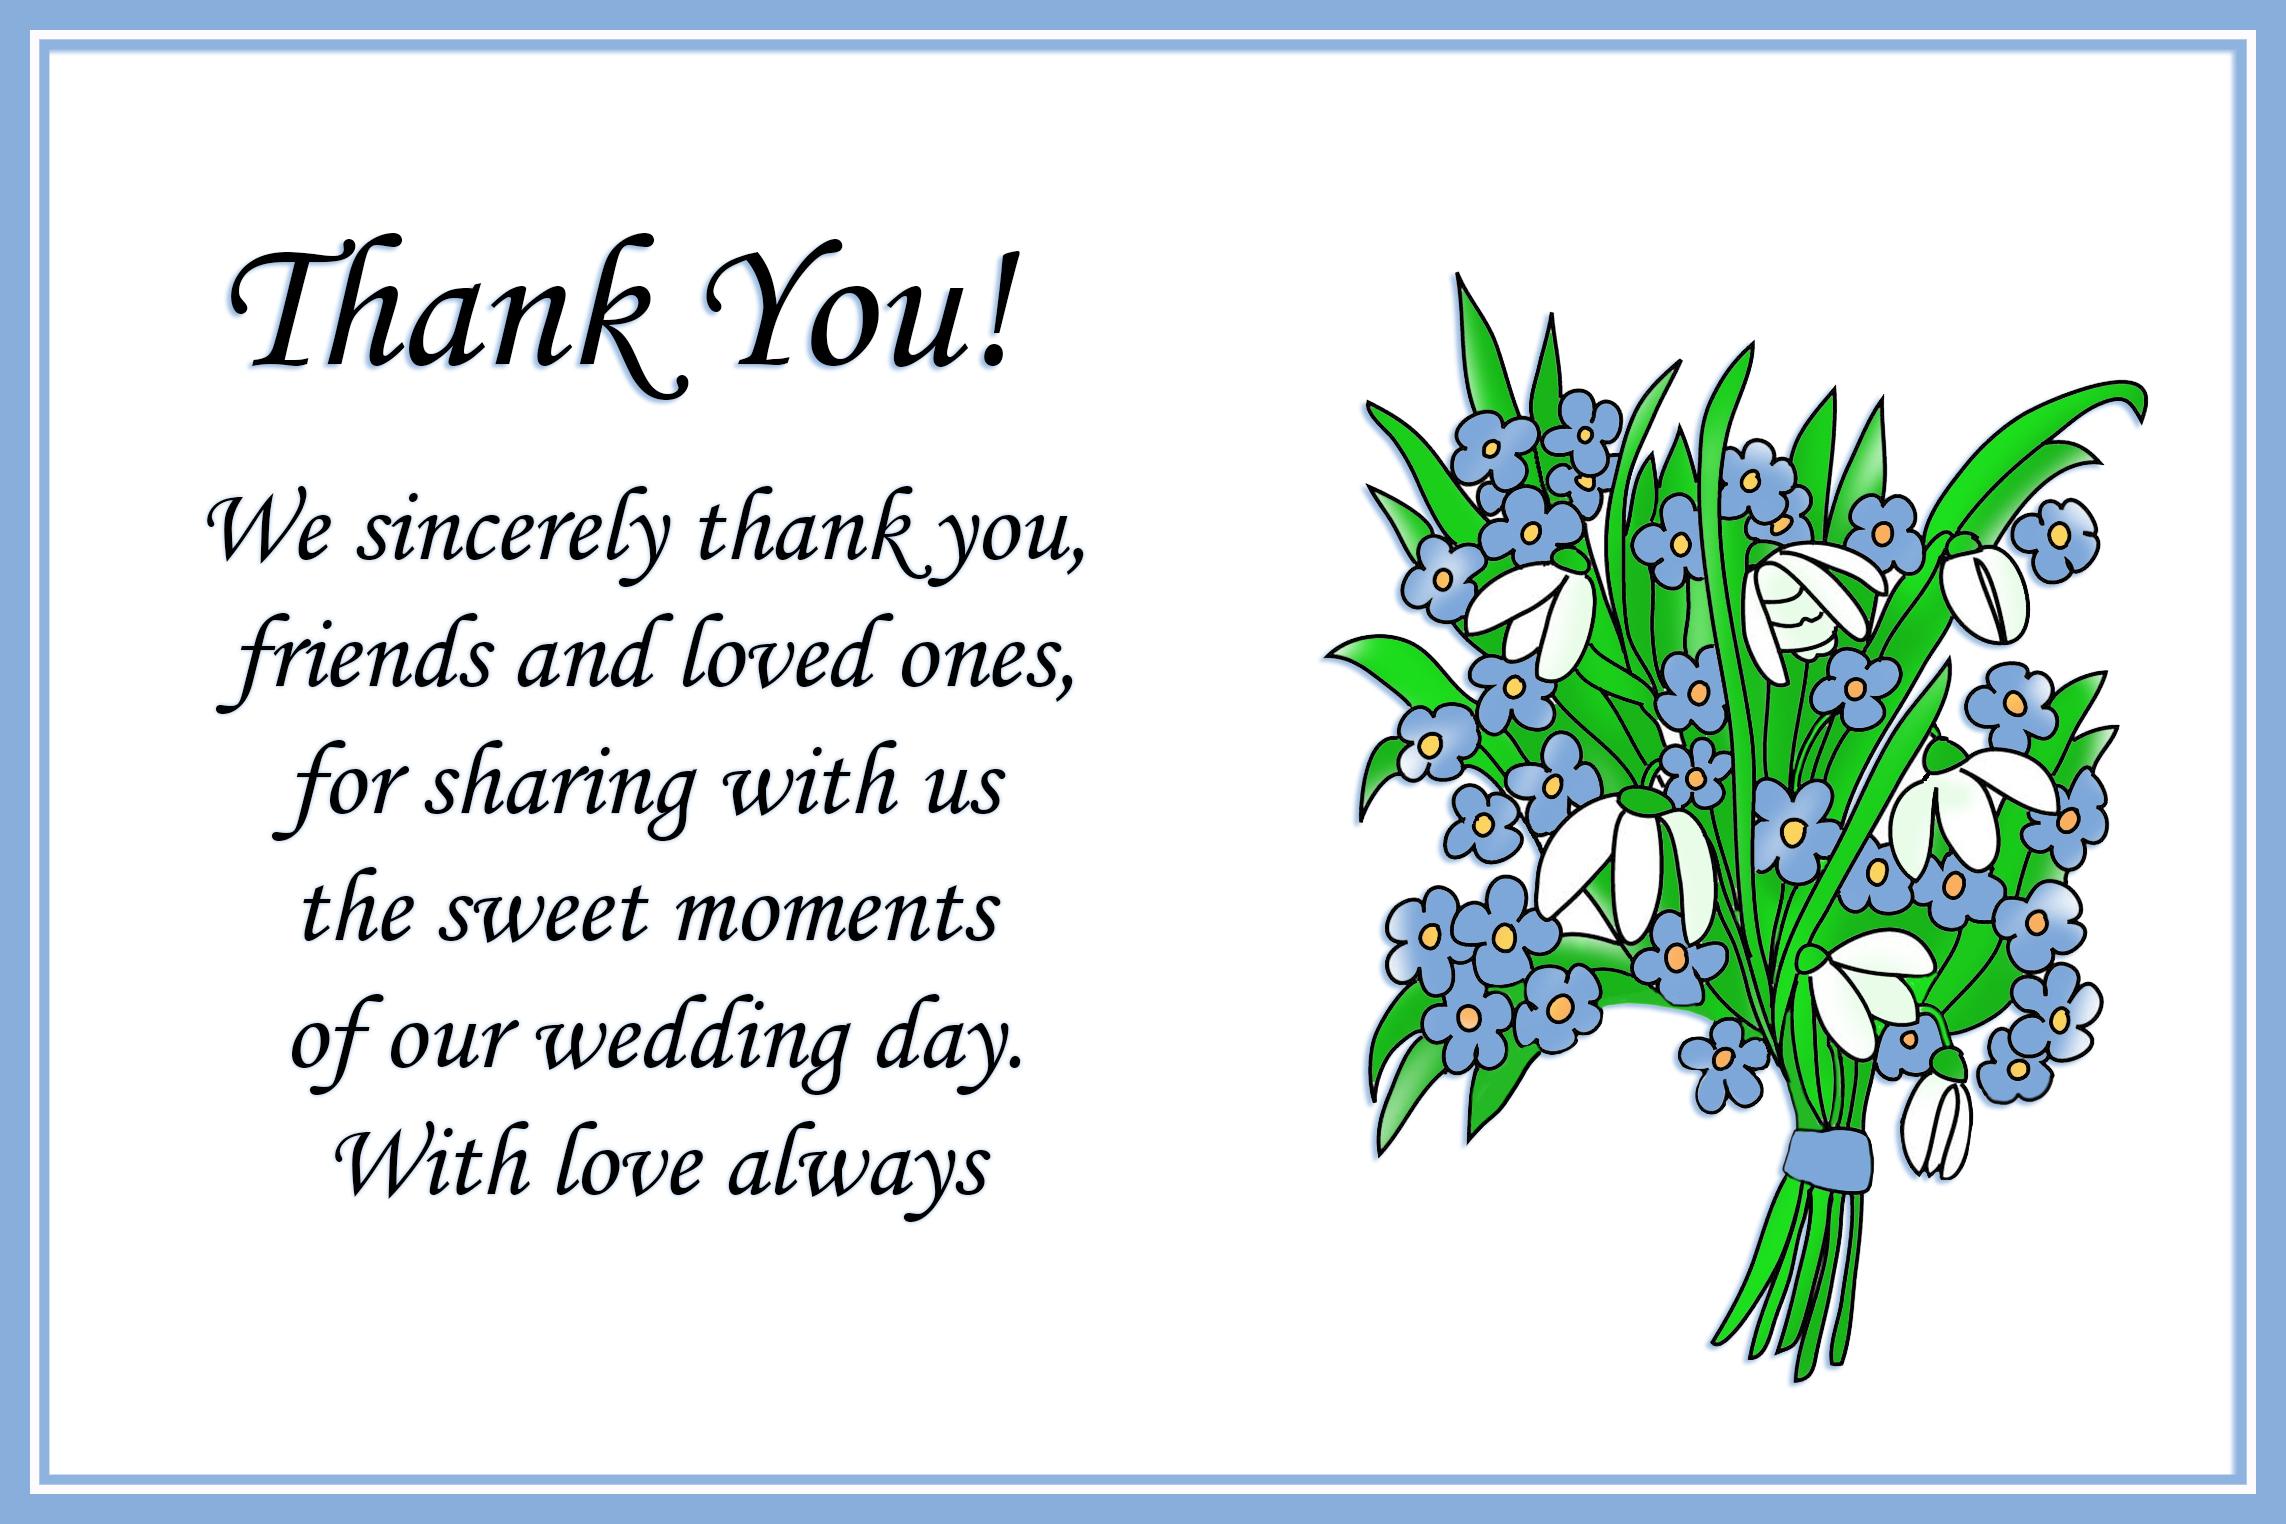 Printable Thank You Cards – Free Printable Wedding Thank You Cards